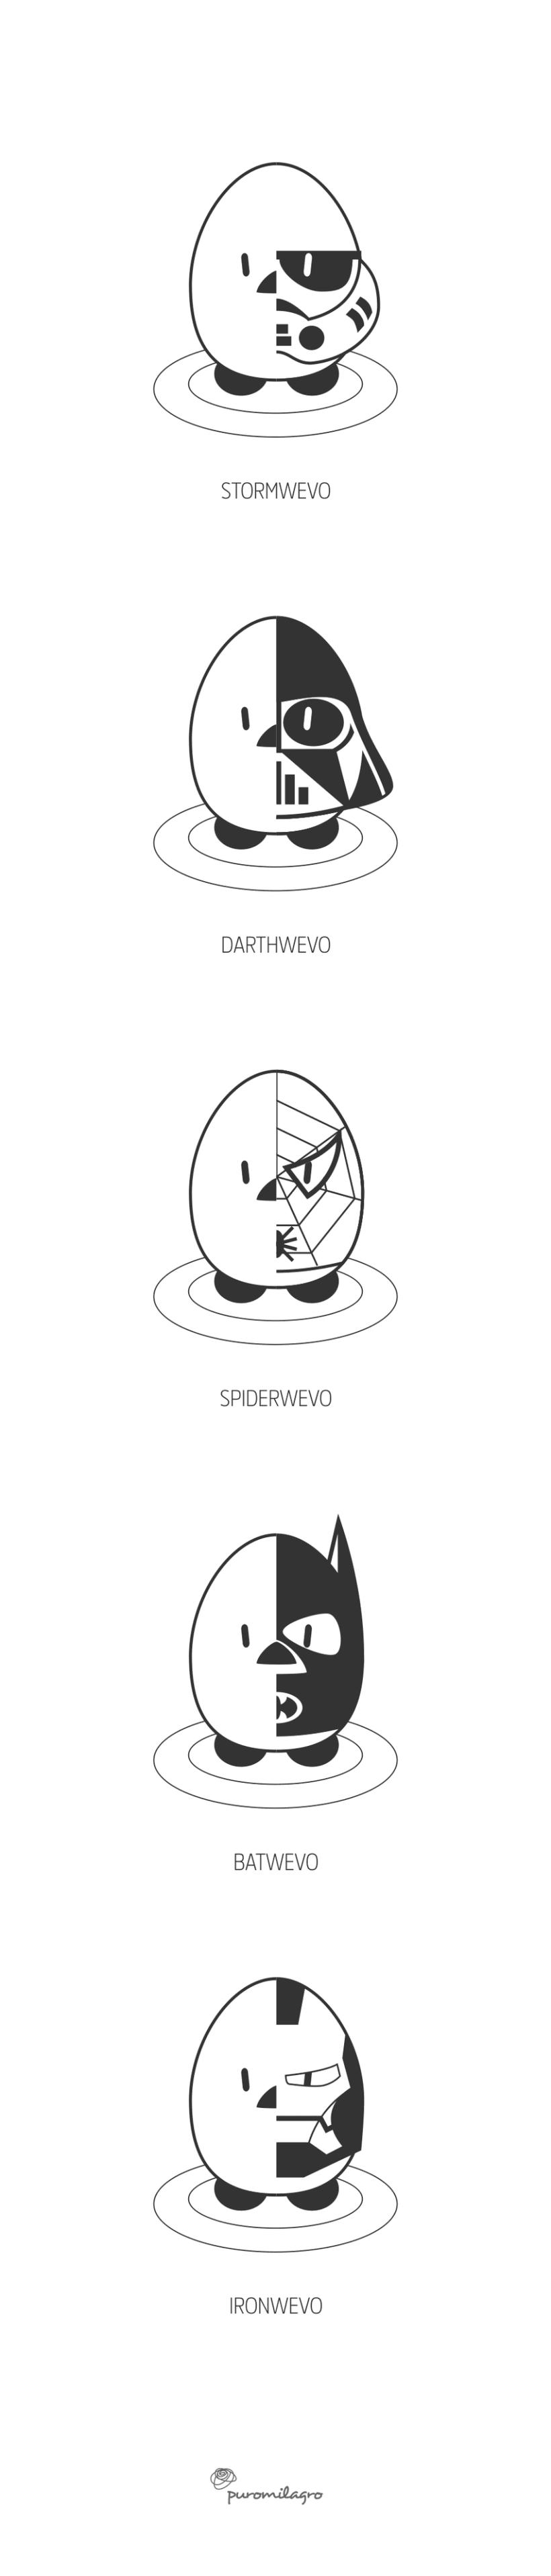 WevoHeroes | Personajes 1